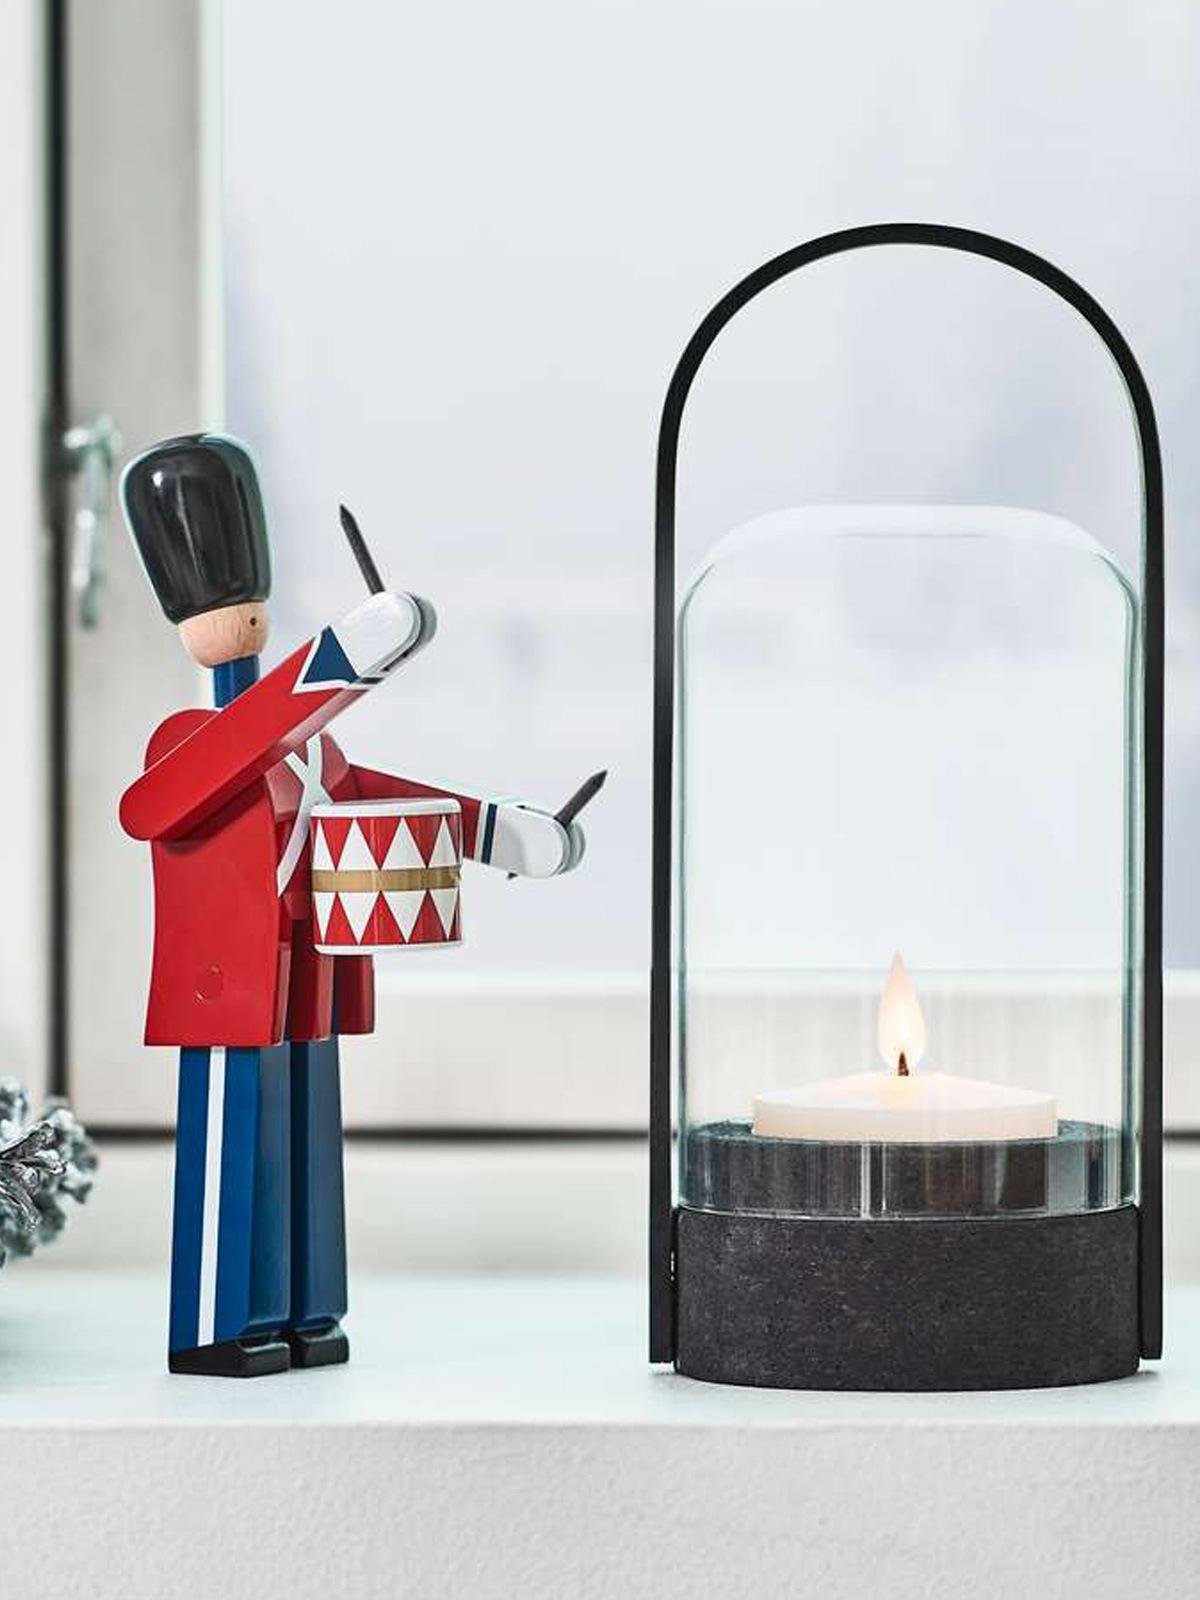 Model 380 Le Klint Candlelight Tischlampen DesignOrt Onlineshop Lampen Berlin Mitte